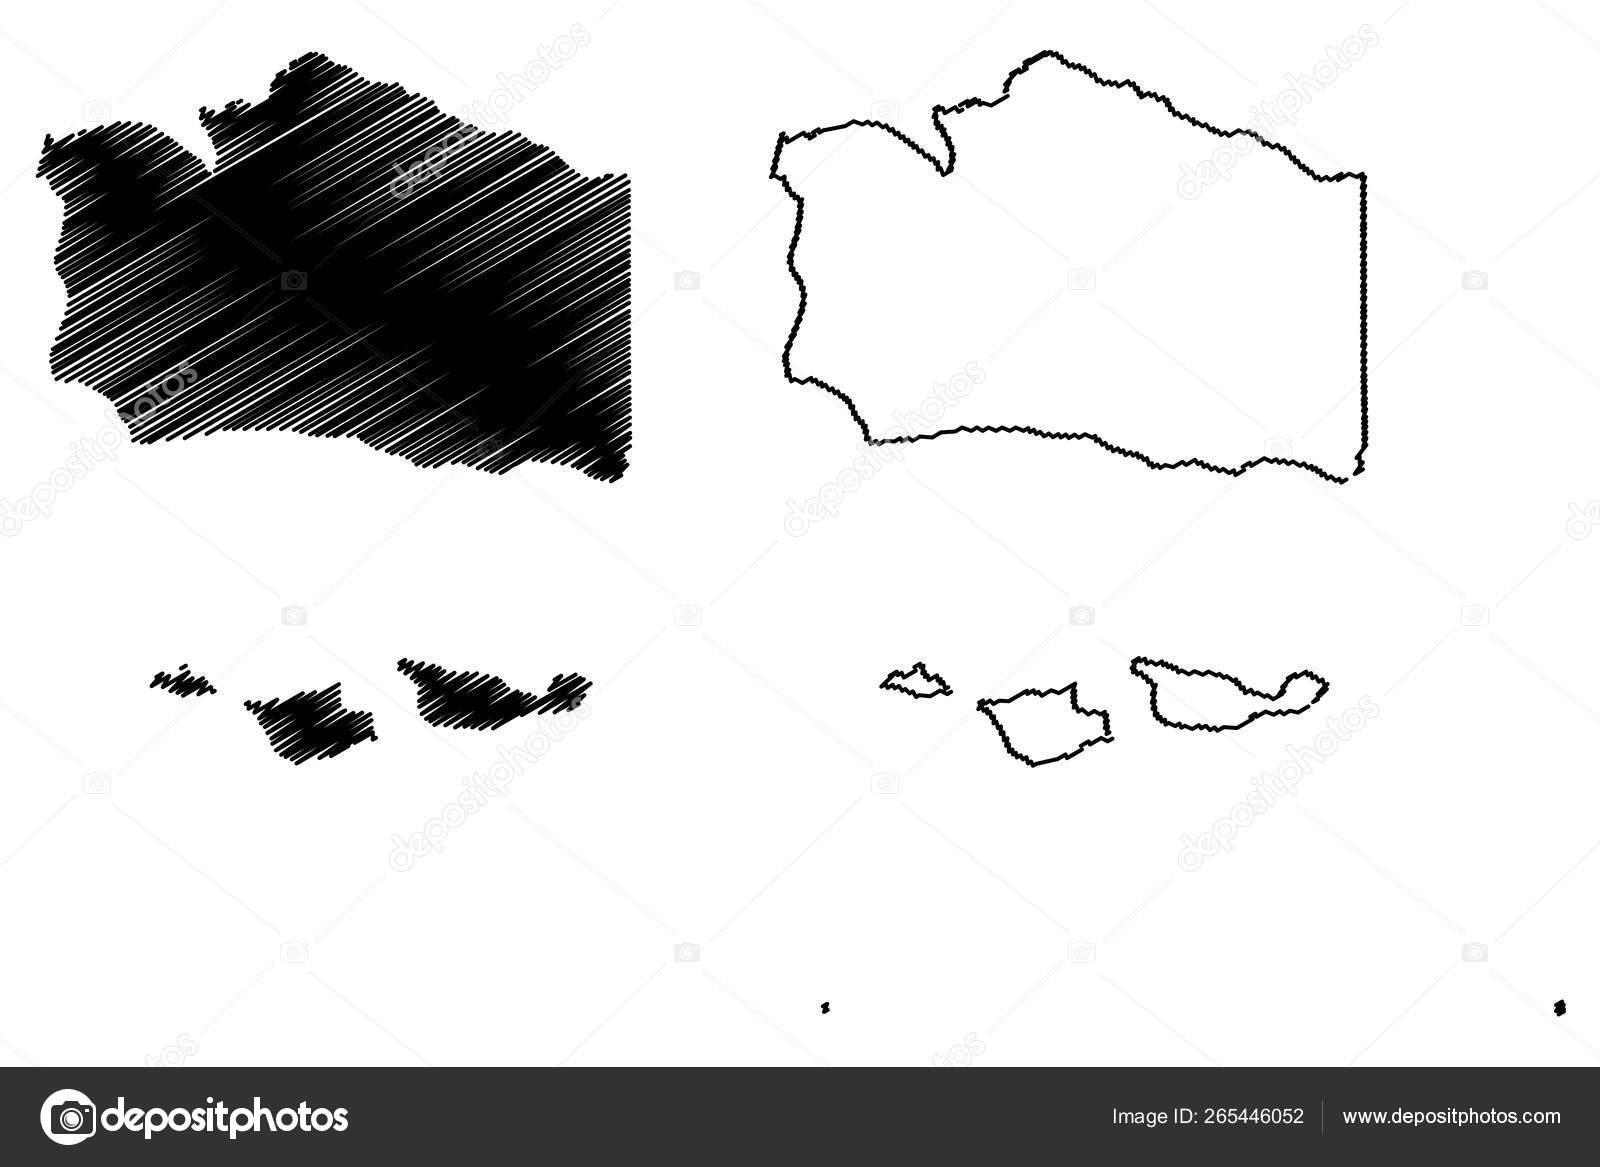 Santa Barbara County, California map vector — Stock Vector ... on ojai california map, san pedro california map, san diego california map, grossmont california map, bay area california map, ventura california map, davis california map, san francisco california map, carmel california map, thousand oaks california map, orange county california map, paso robles california map, anaheim california map, mono lake california map, palm springs california map, lake tahoe california map, long beach california map, pacific coast highway california map, los angeles california map, turlock california map,